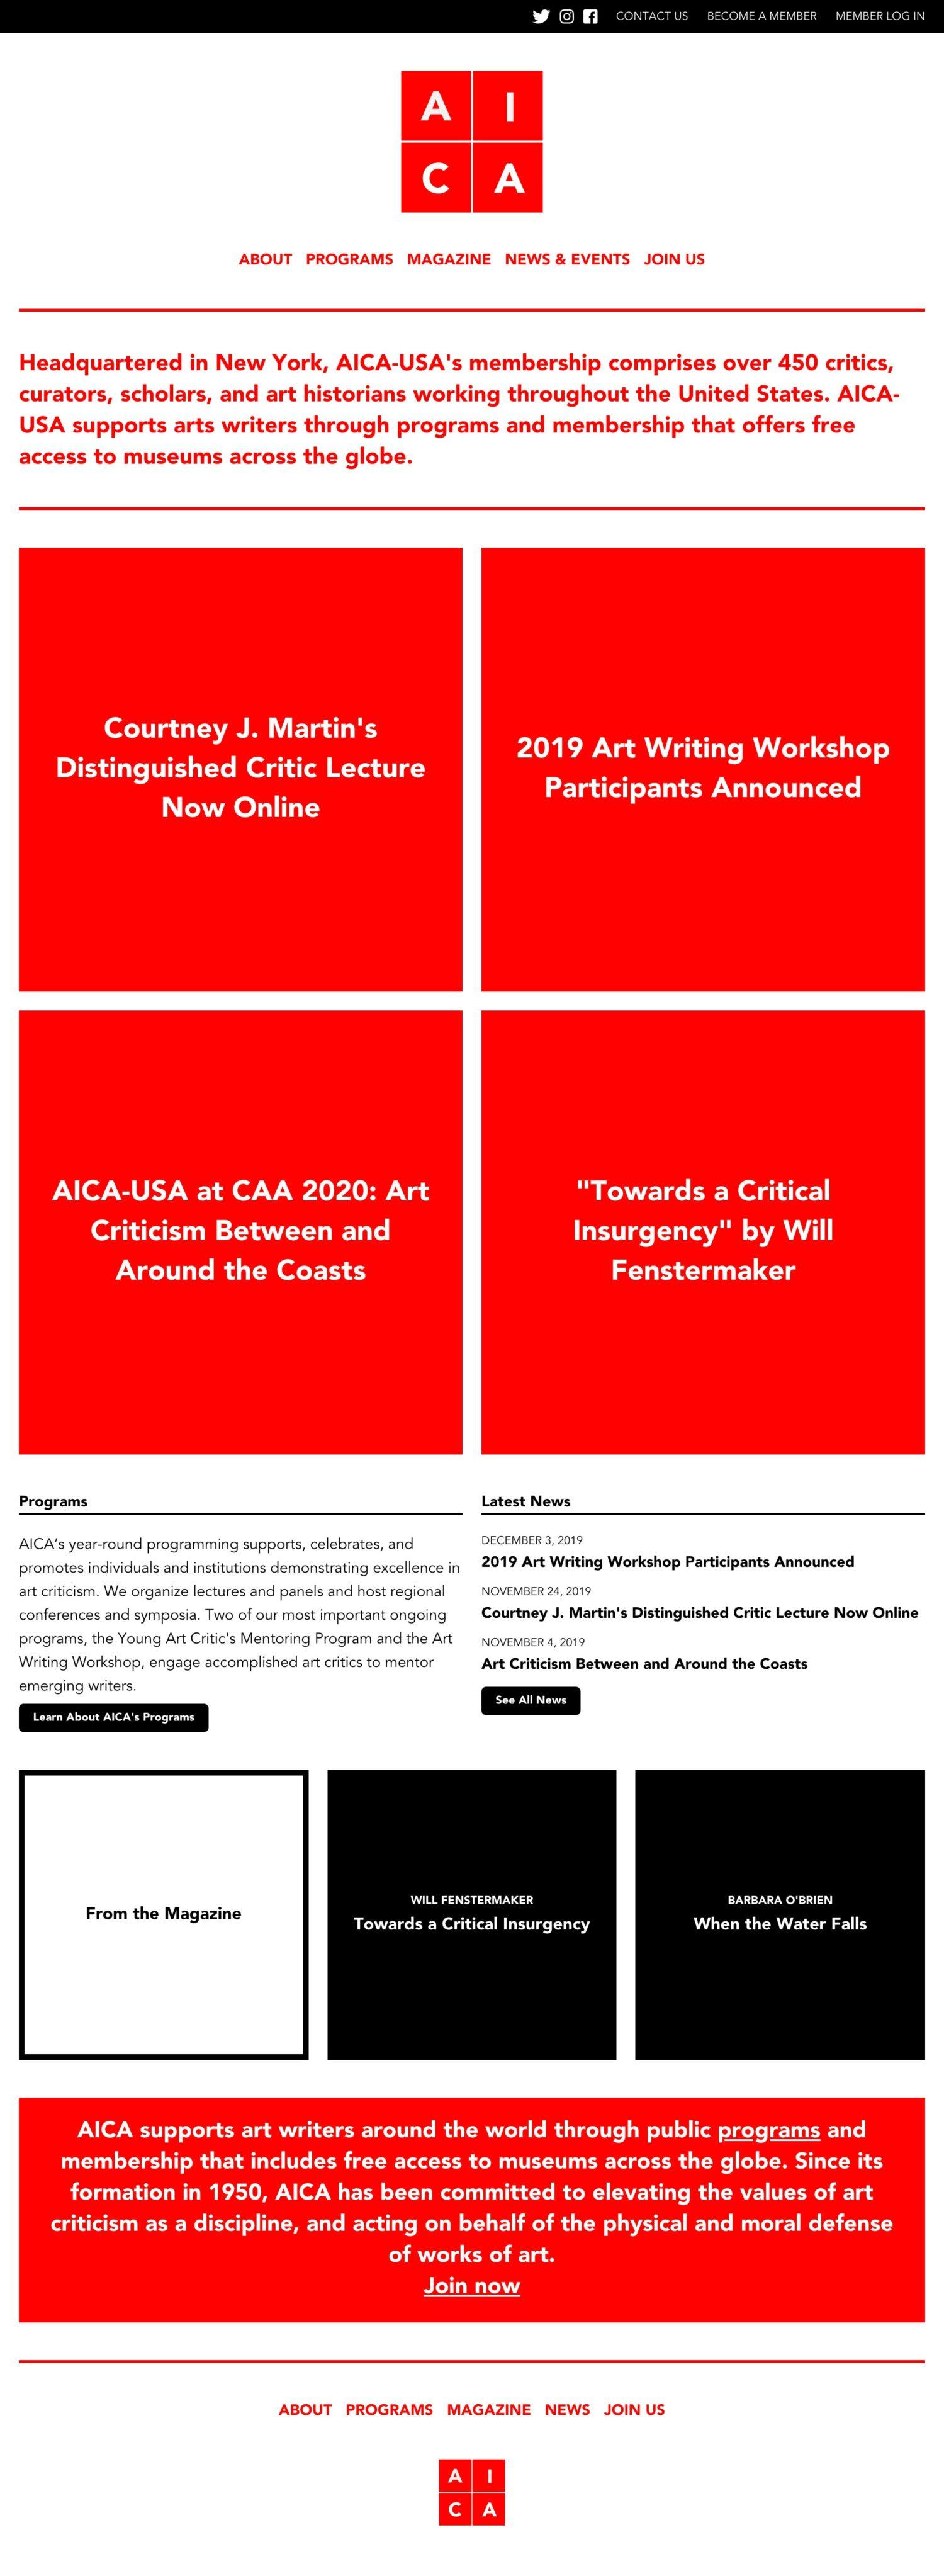 Screenshot of the AICA-USA website's homepage